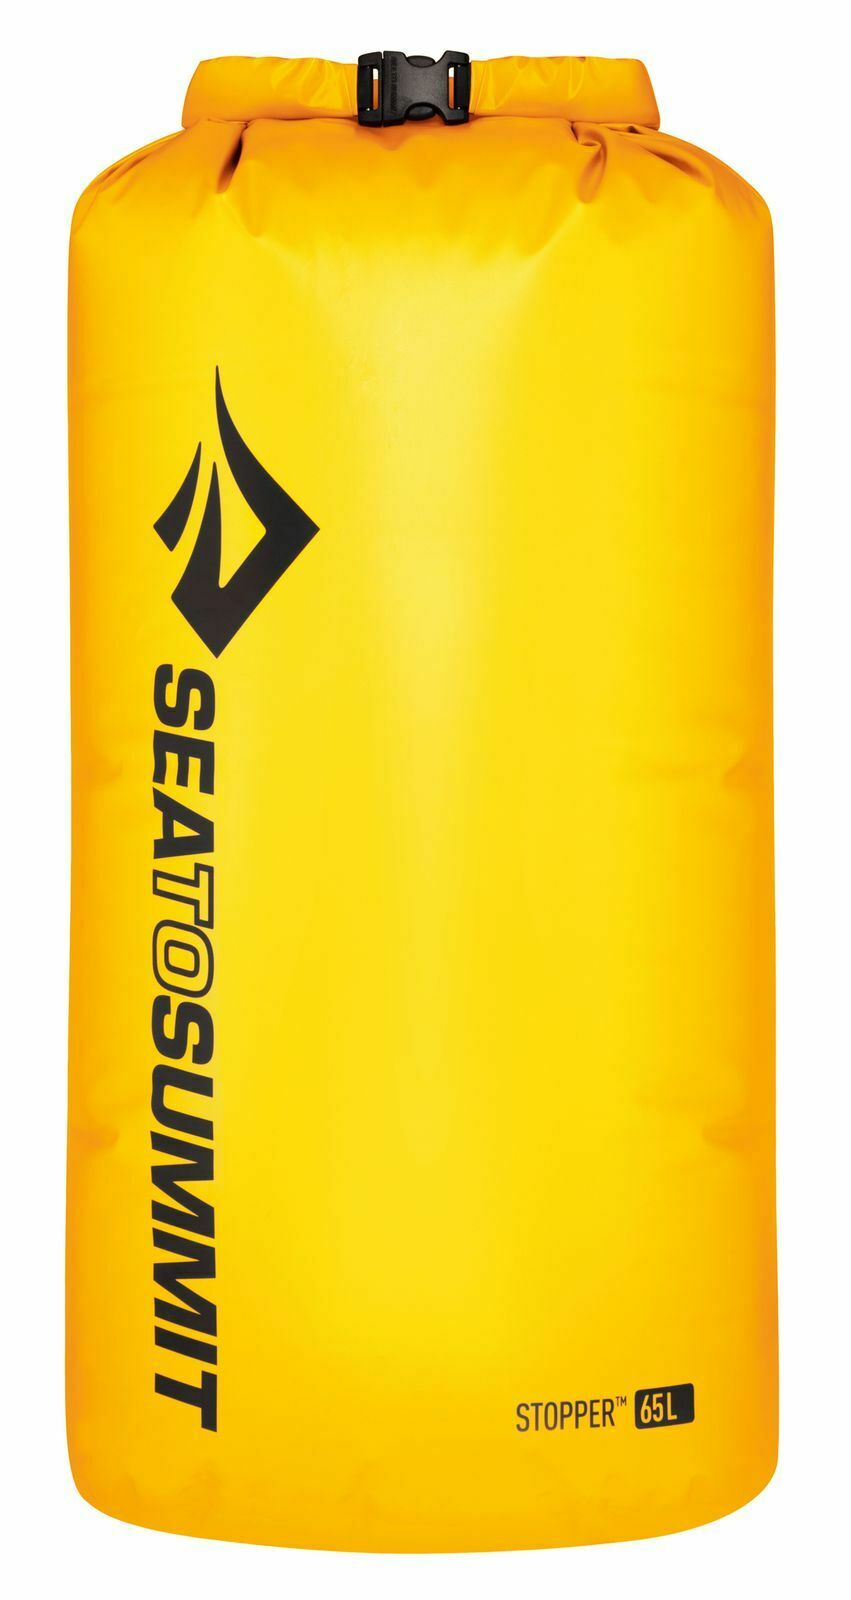 SEA TO SUMMIT Stopper Dry Bag 65L Giallo